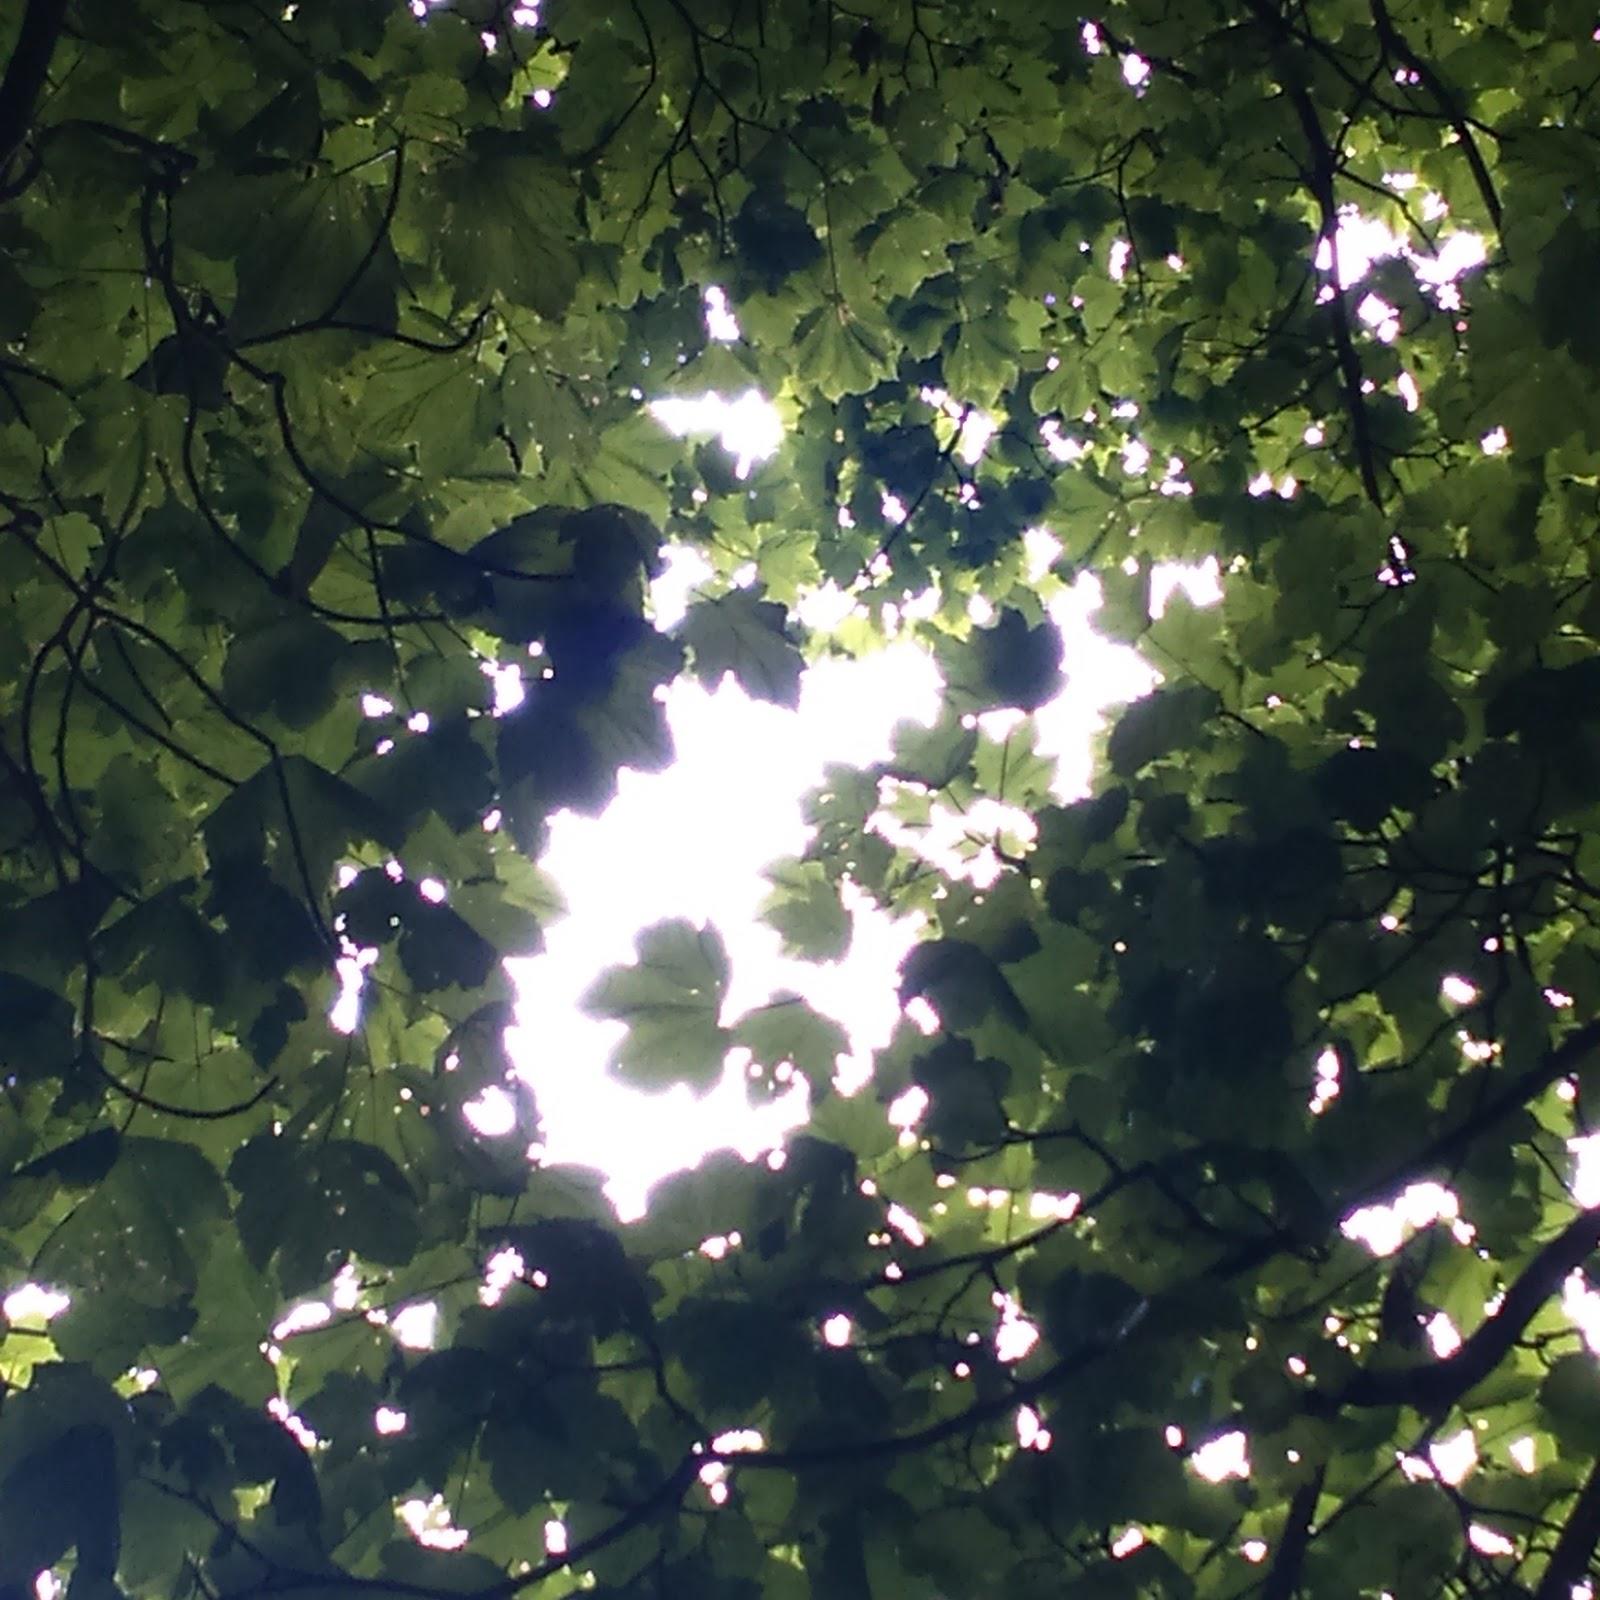 Sunlight through leafy tree canopy